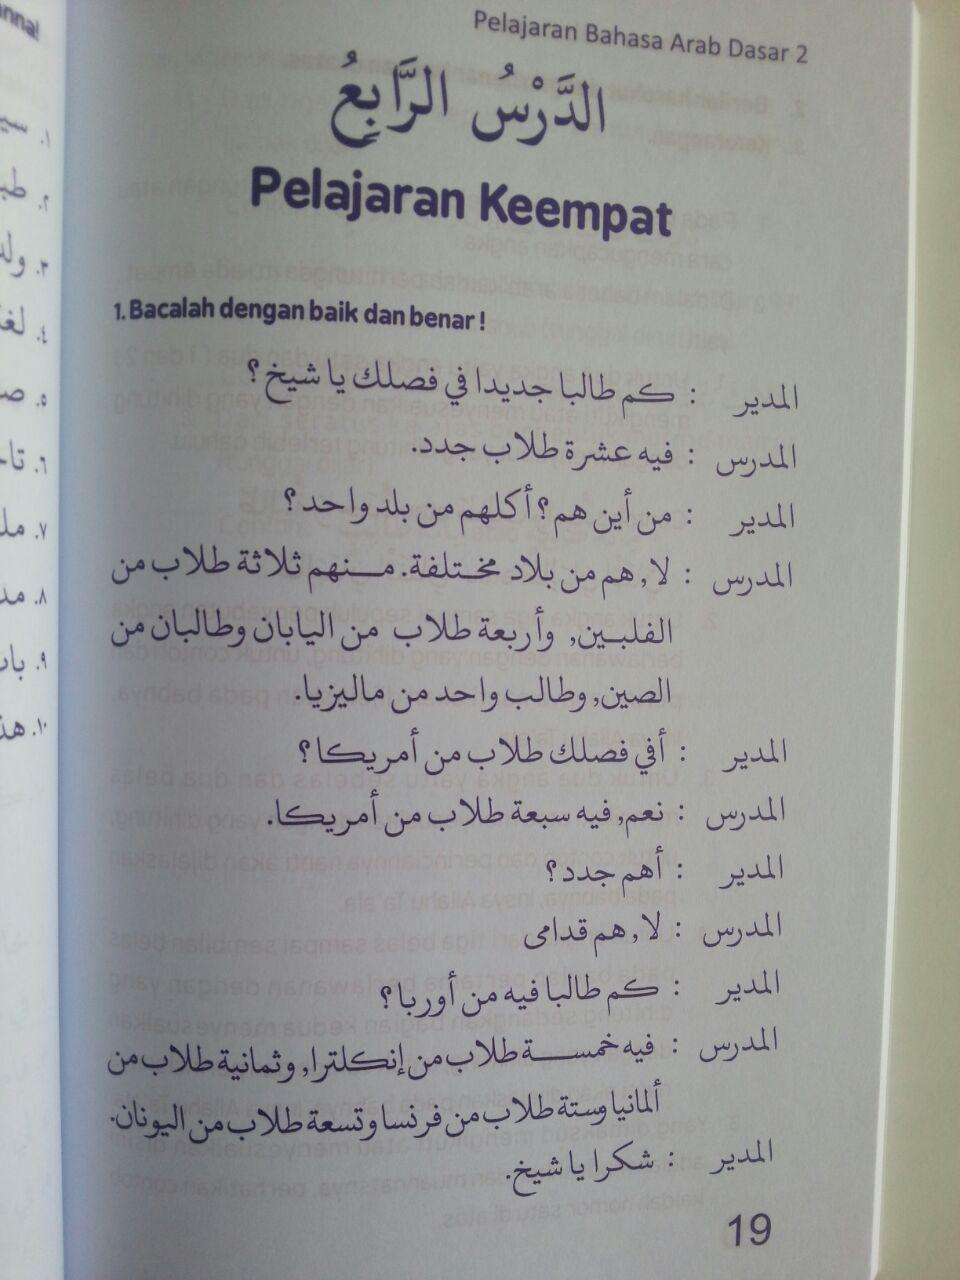 Buku Pelajaran Bahasa Arab Dasar 2 Latihan Percakapan isi 4